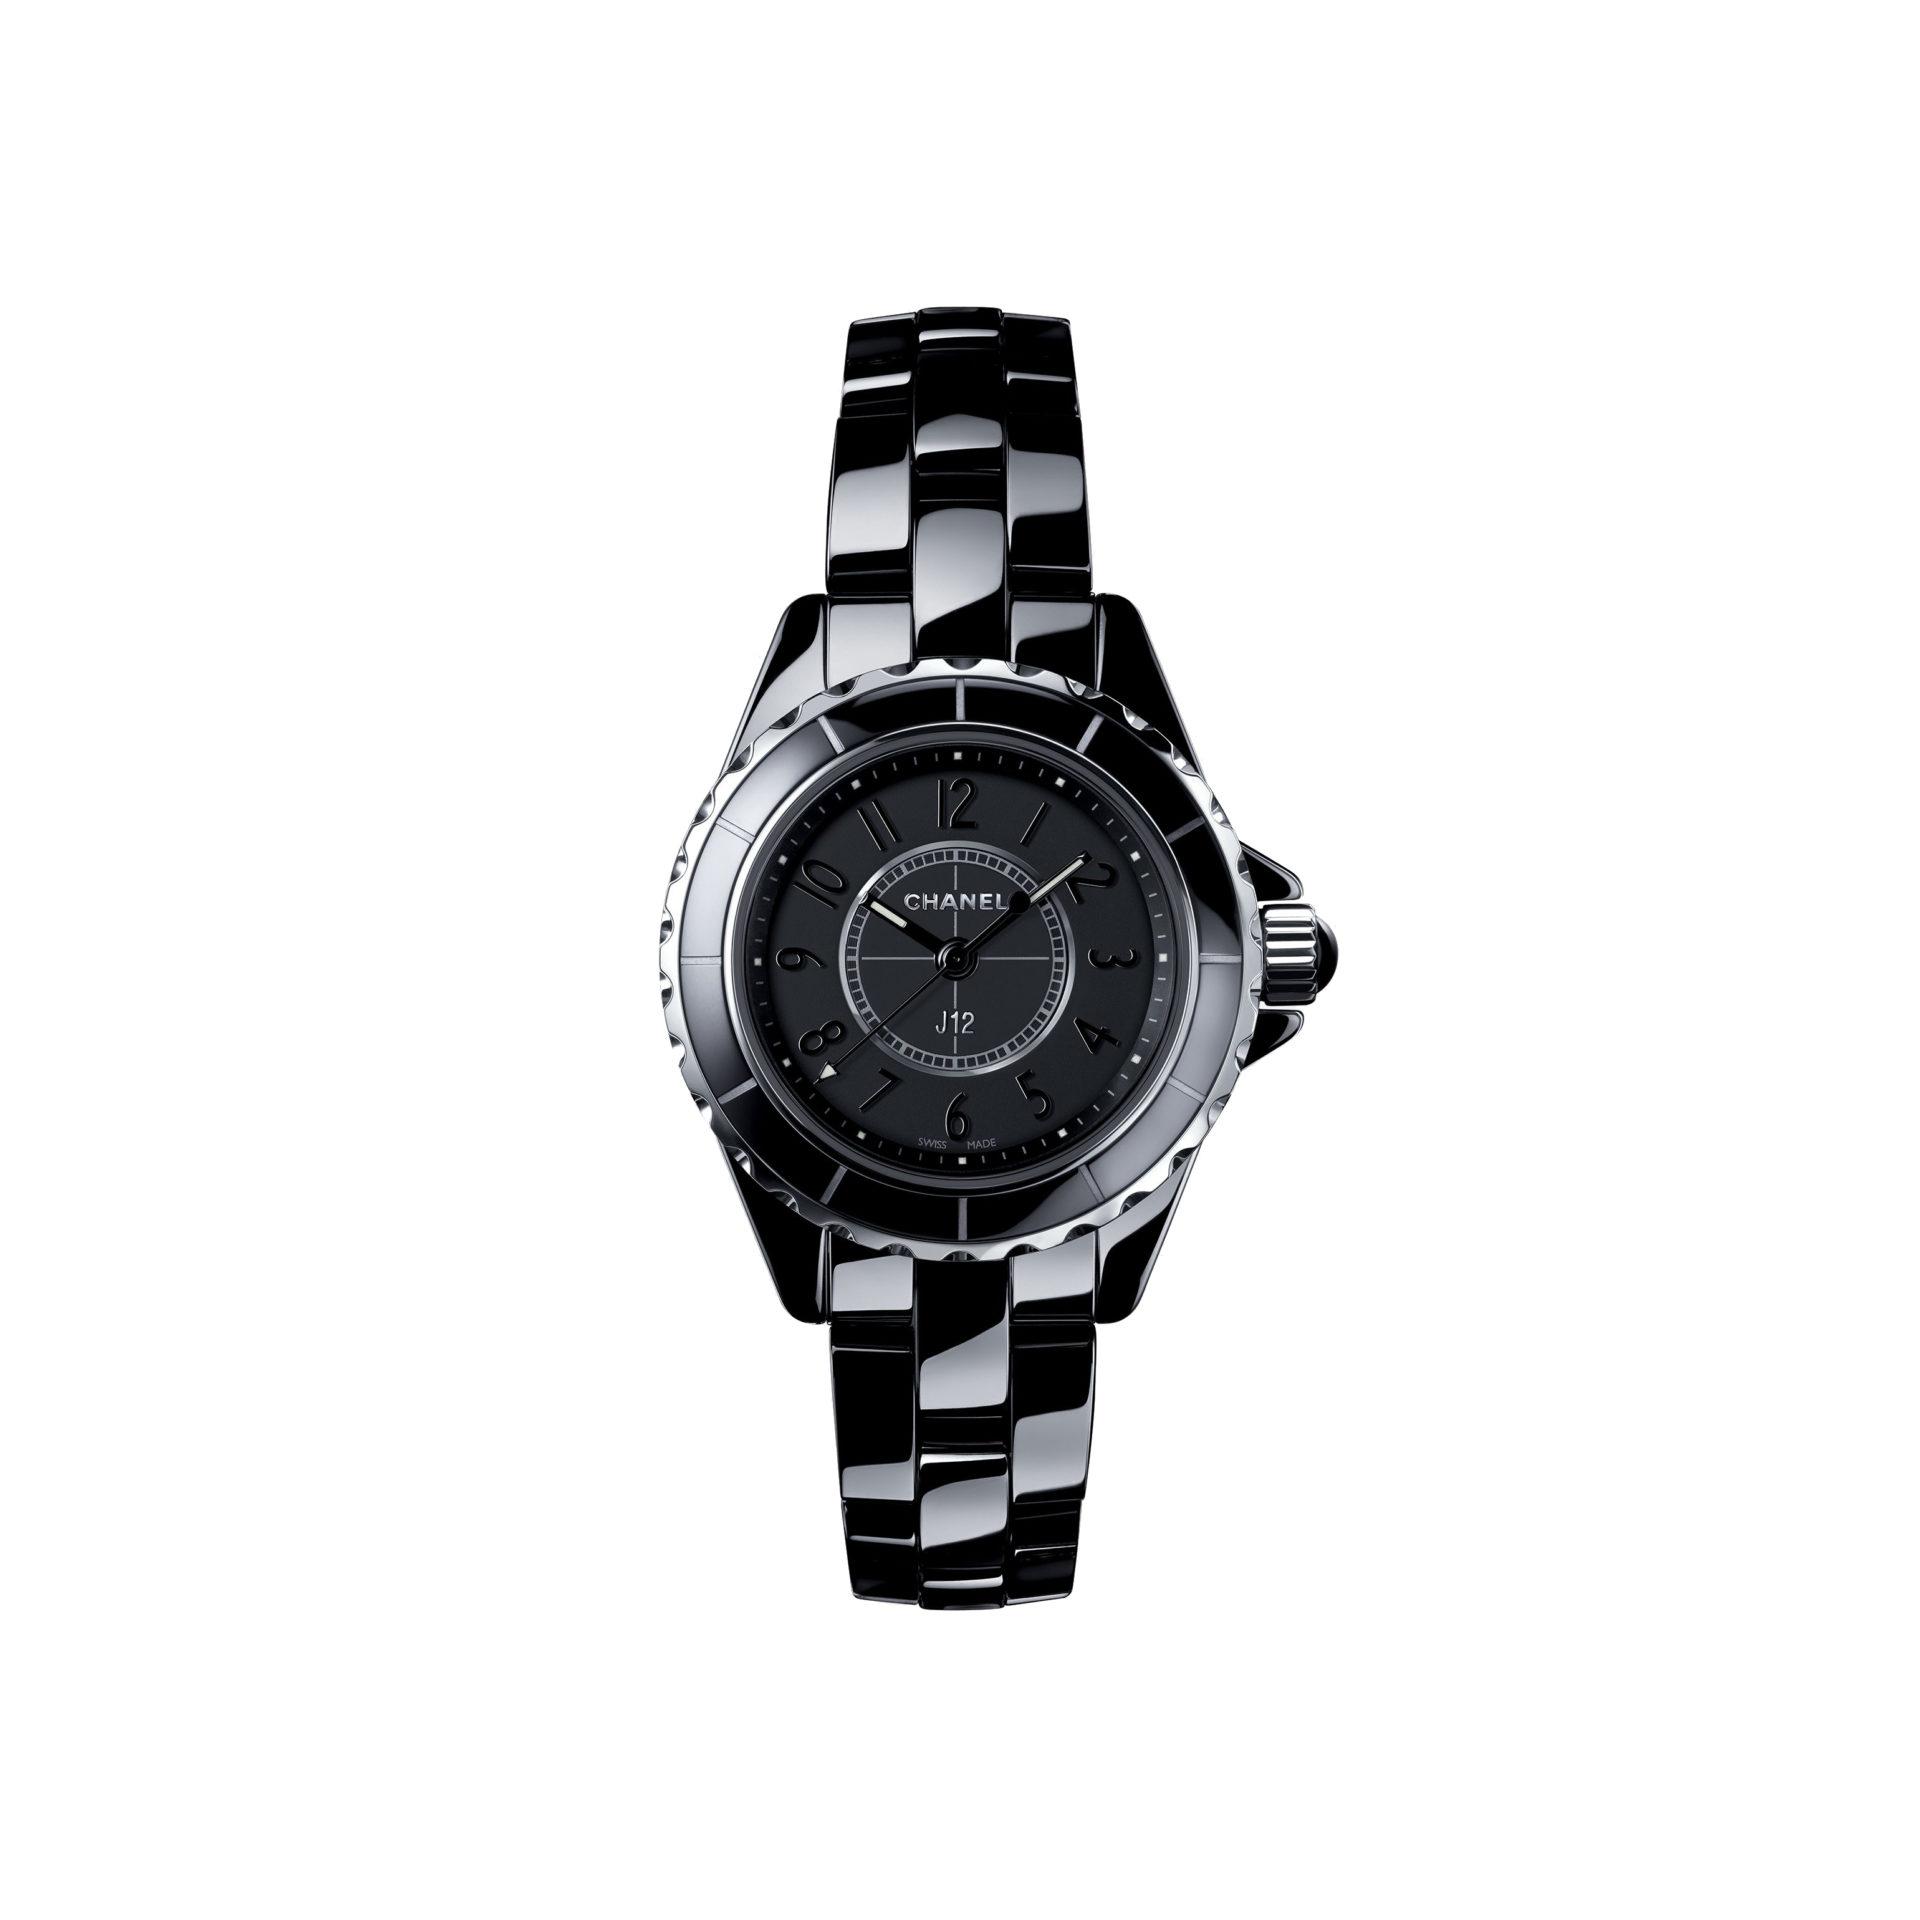 Chanel-J12-Intense-Black-Hall-of-Time-H4196